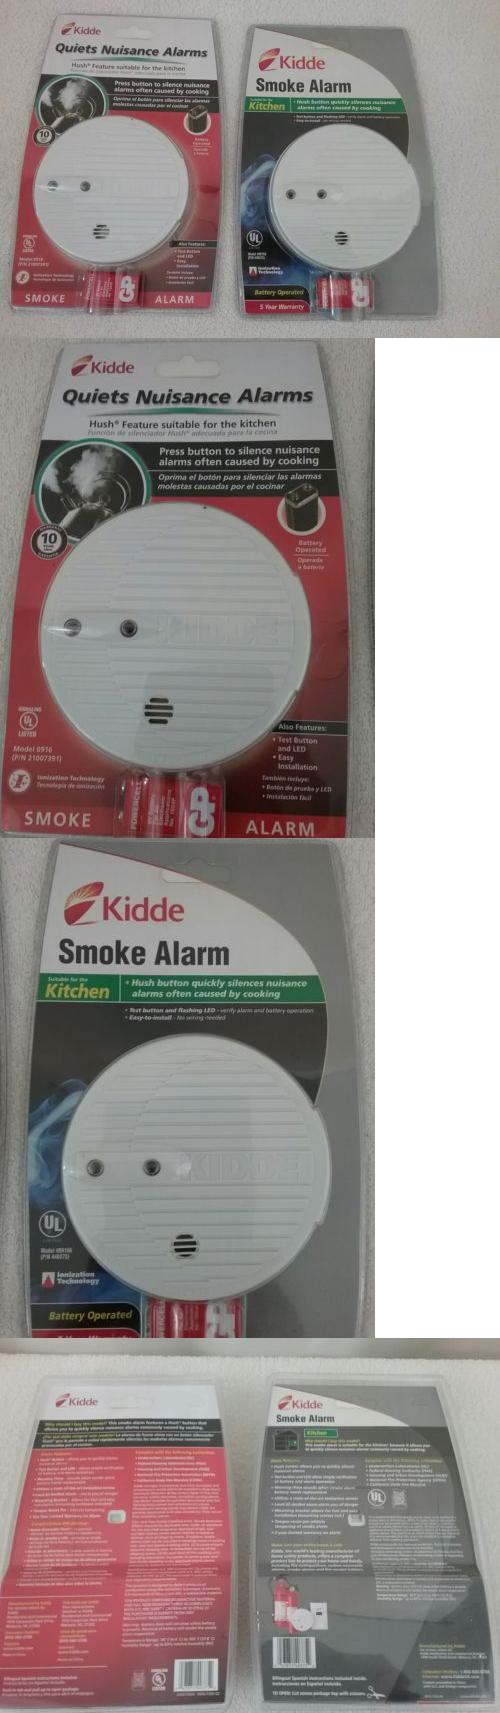 Smoke Detectors 115942 2 Bundle Kidde Fire Alarm Protection Kitchen Home